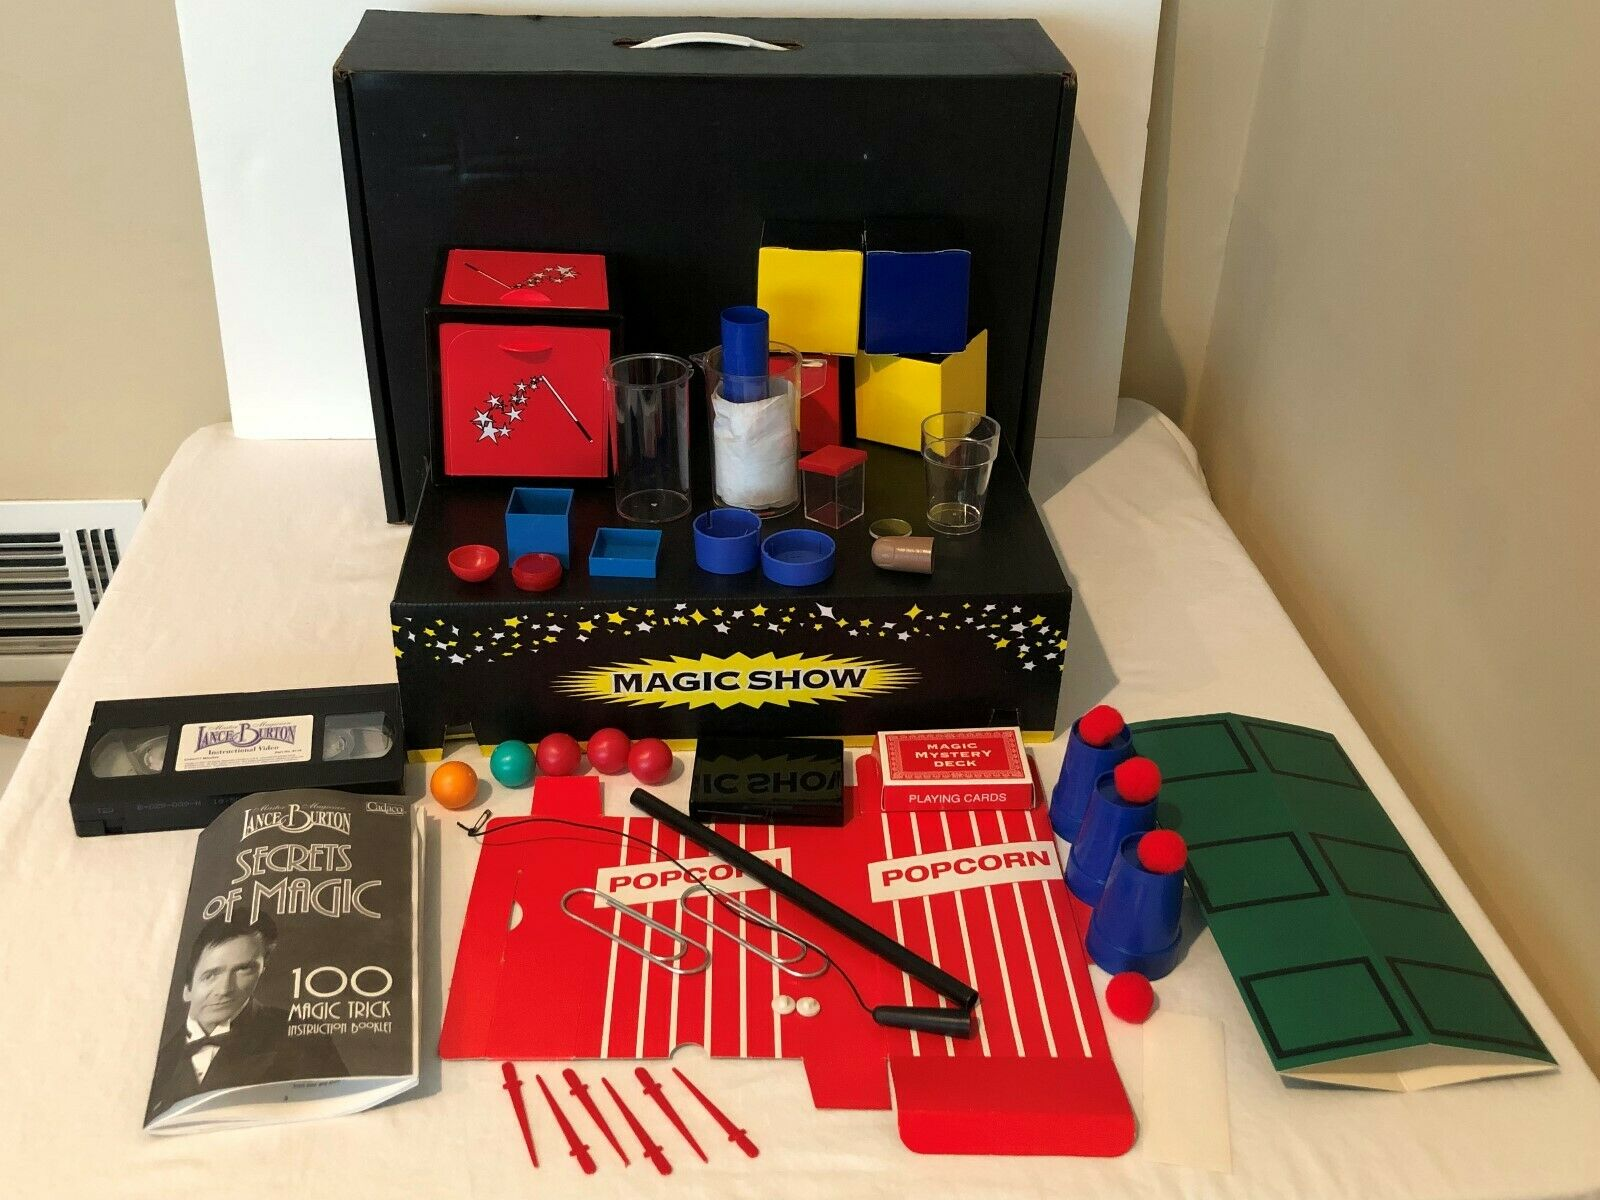 Lance Burton Vintage Master Magician Secrets of Magic Show Set 100 Magic Tricks